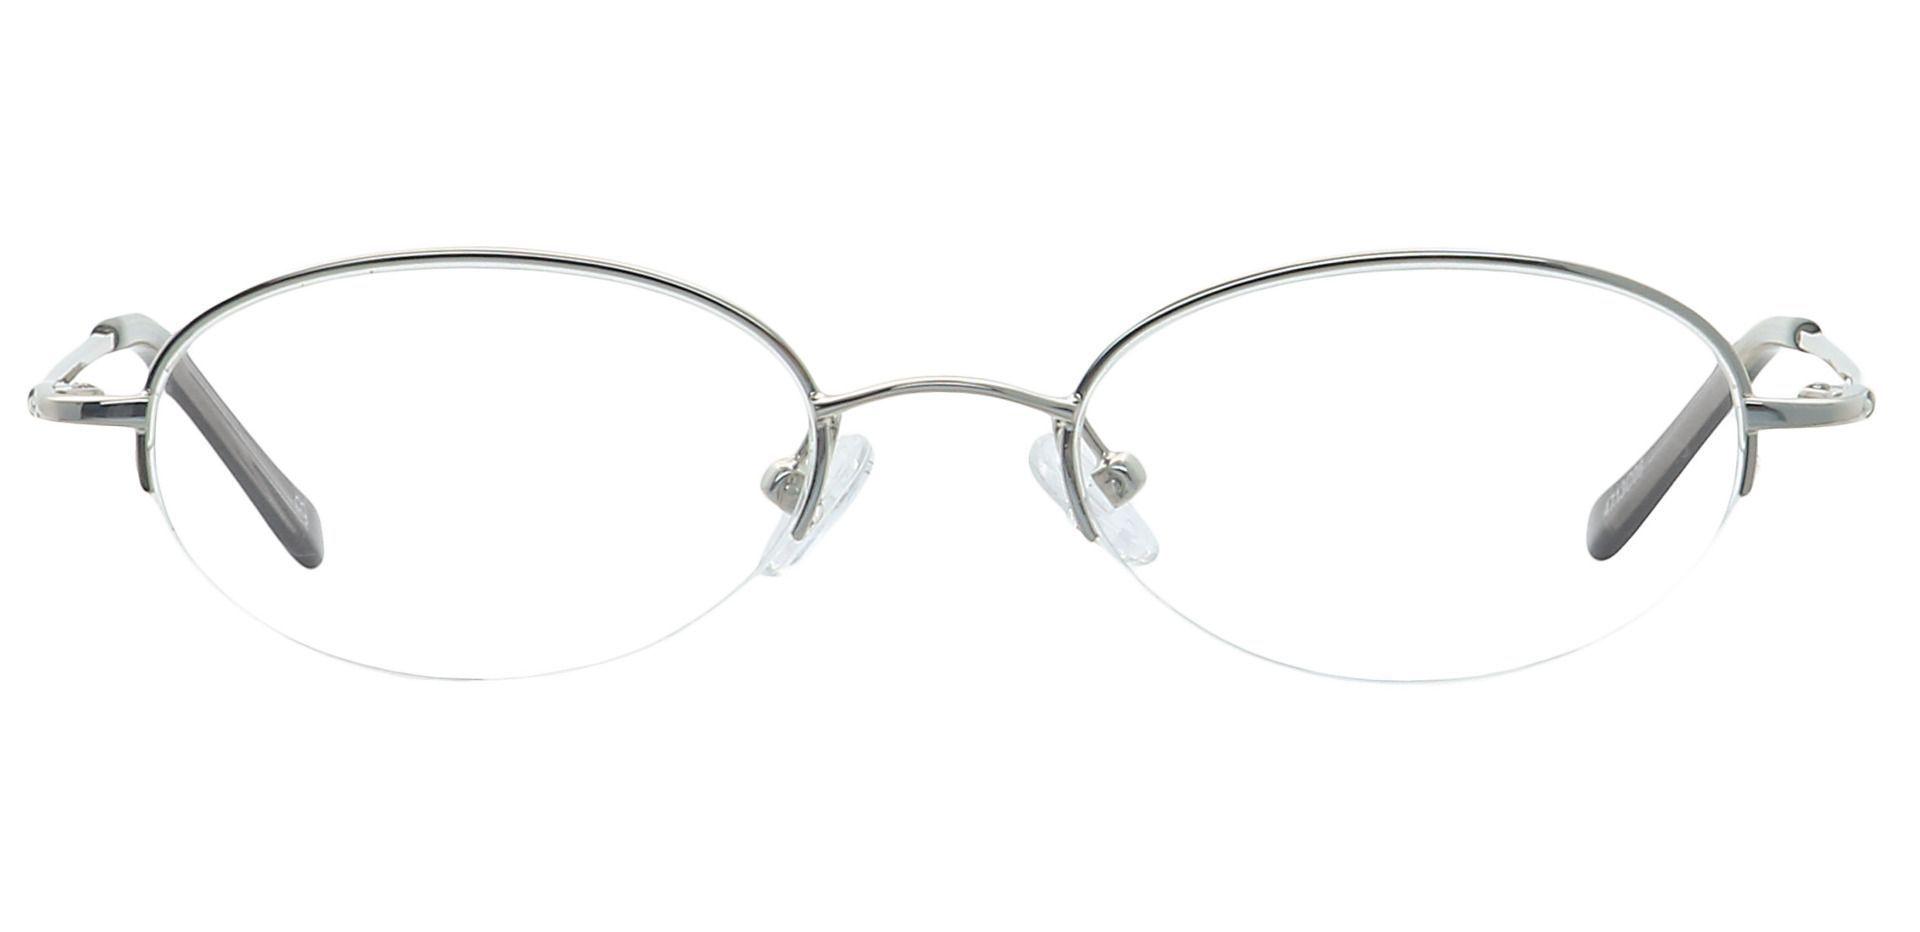 Nicole Oval Blue Light Blocking Glasses - Clear